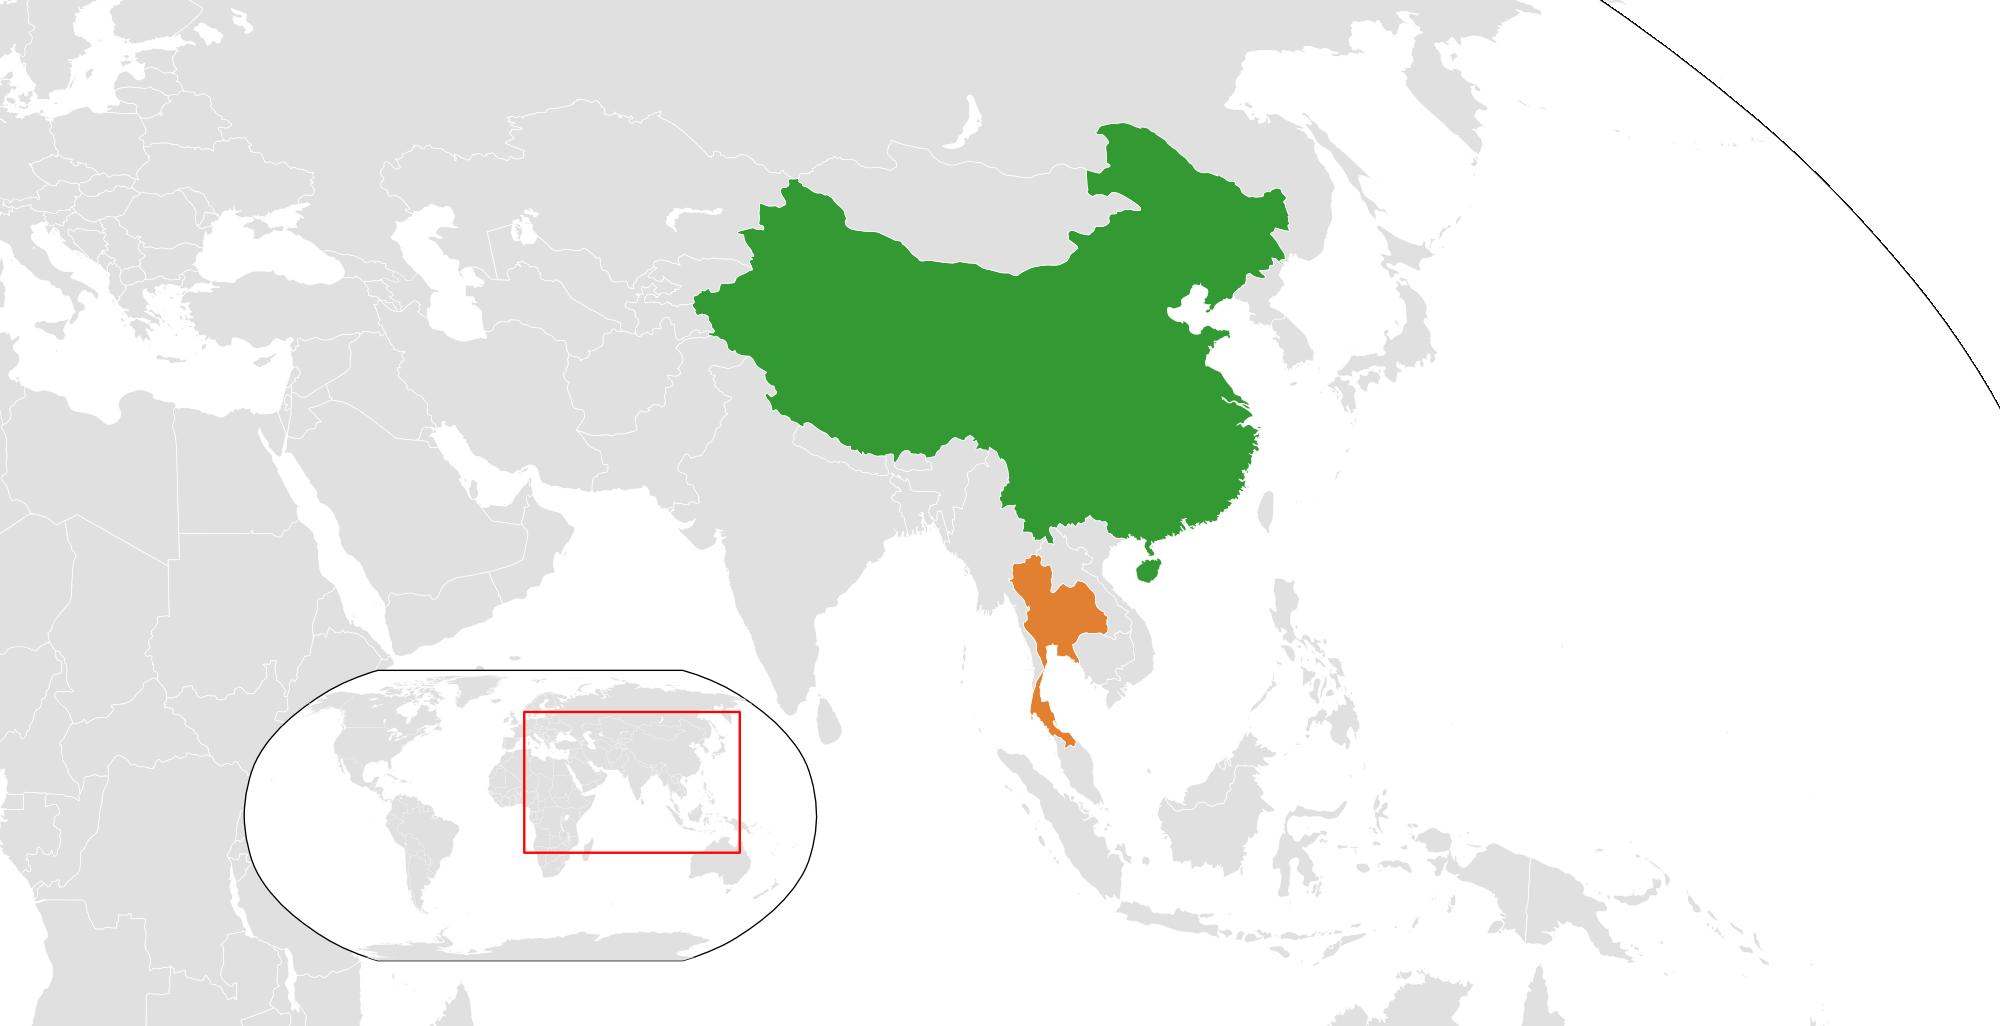 Filechina thailand locatorg wikimedia commons filechina thailand locatorg gumiabroncs Choice Image